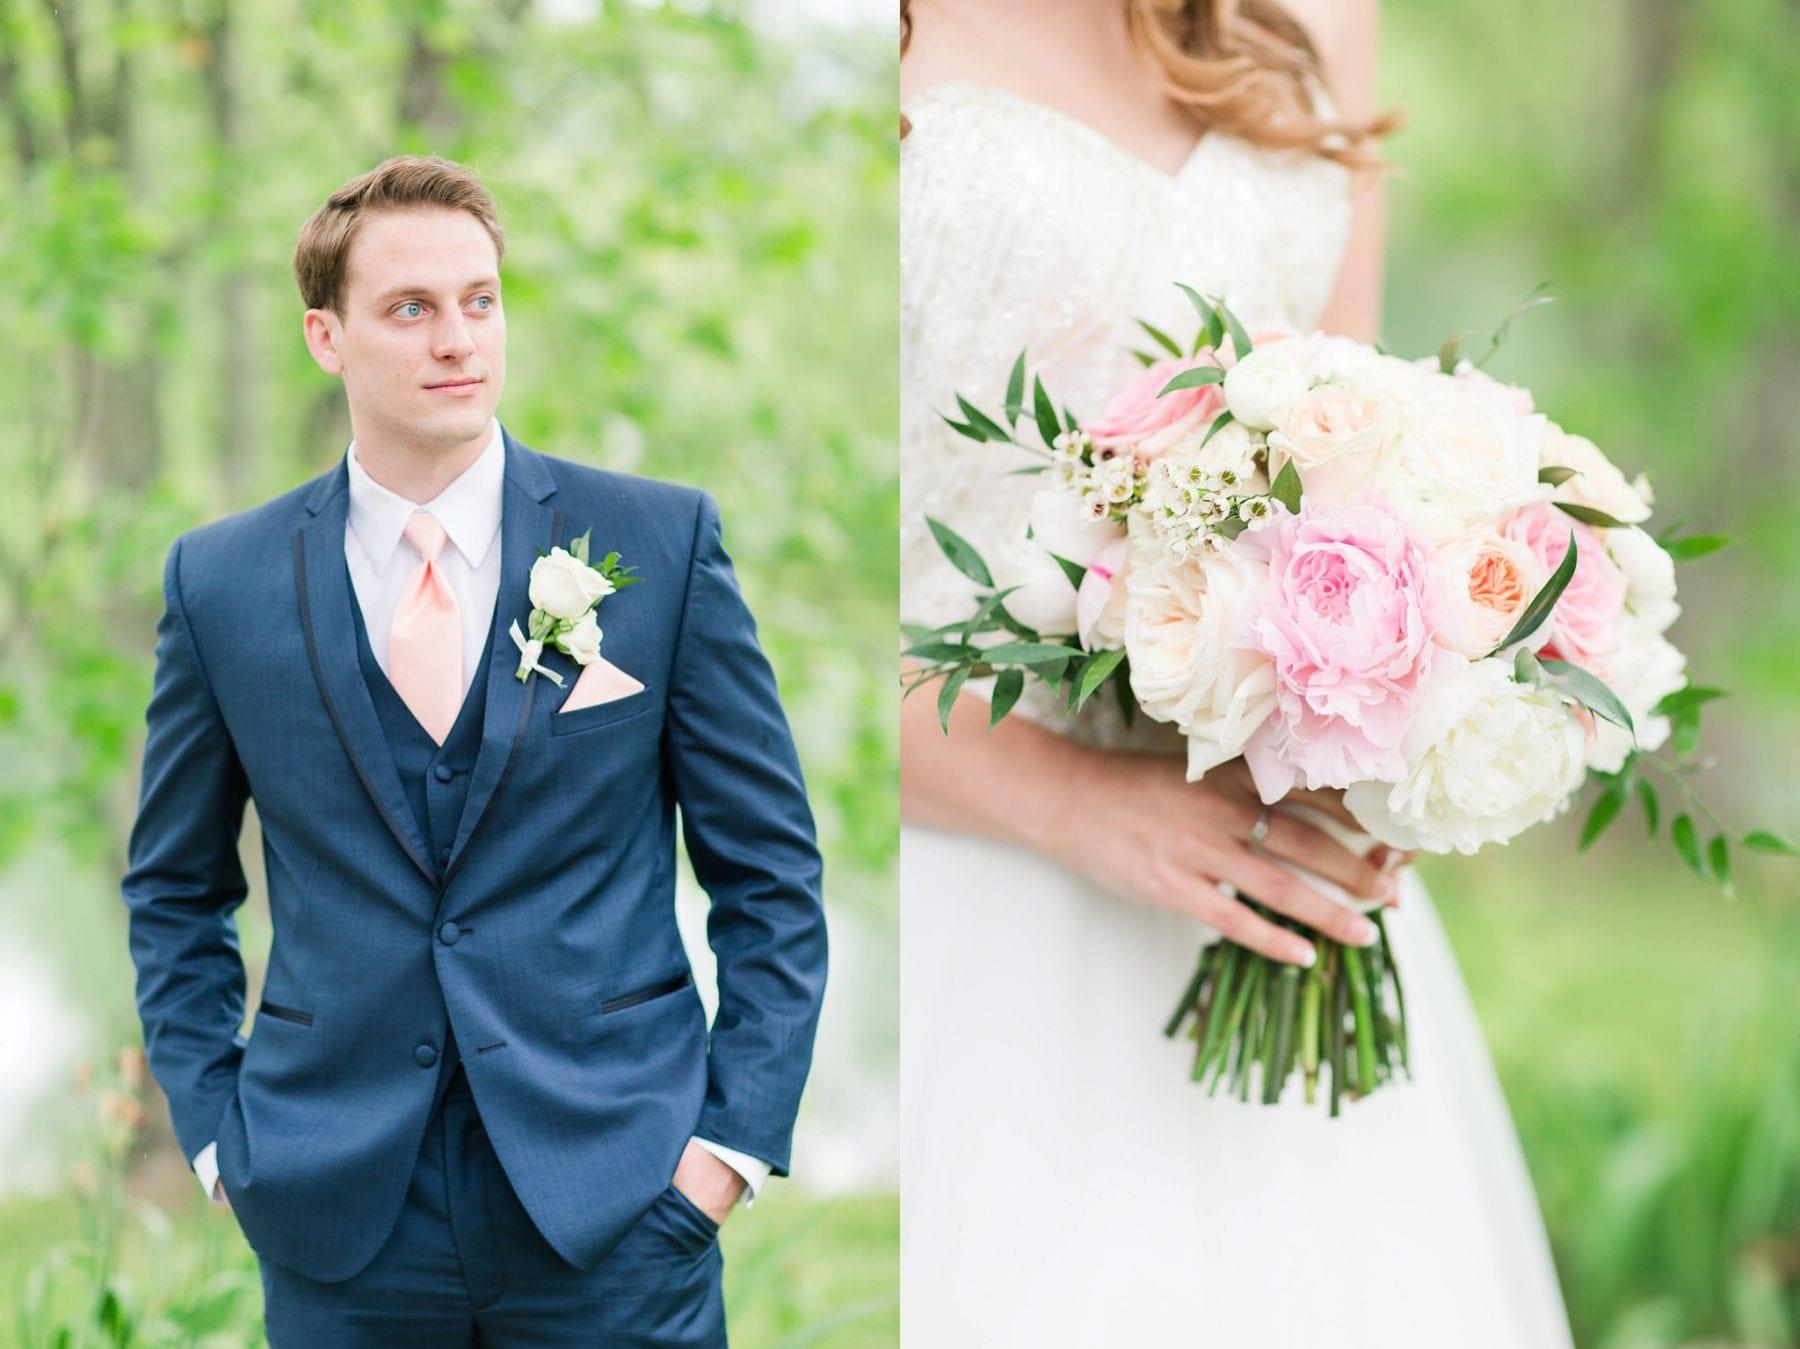 Justin & Megan Big Spring Farm Wedding Photos-108.jpg